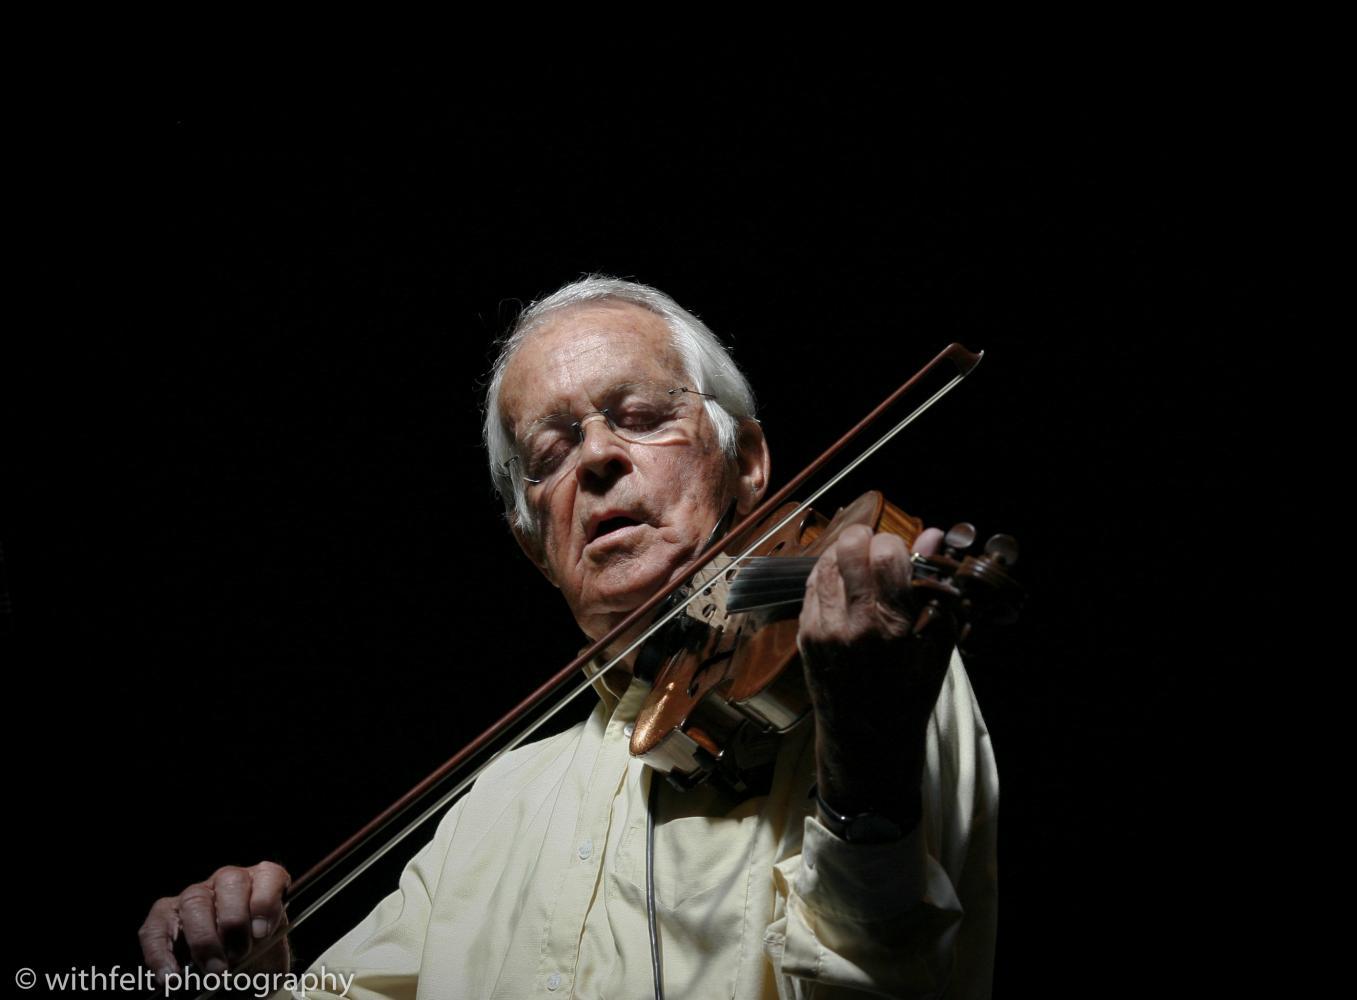 Svend Asmussen  1916 – 2017    RIP  A legend has left us the world famous Danish jazz violinist Svend Asmussen